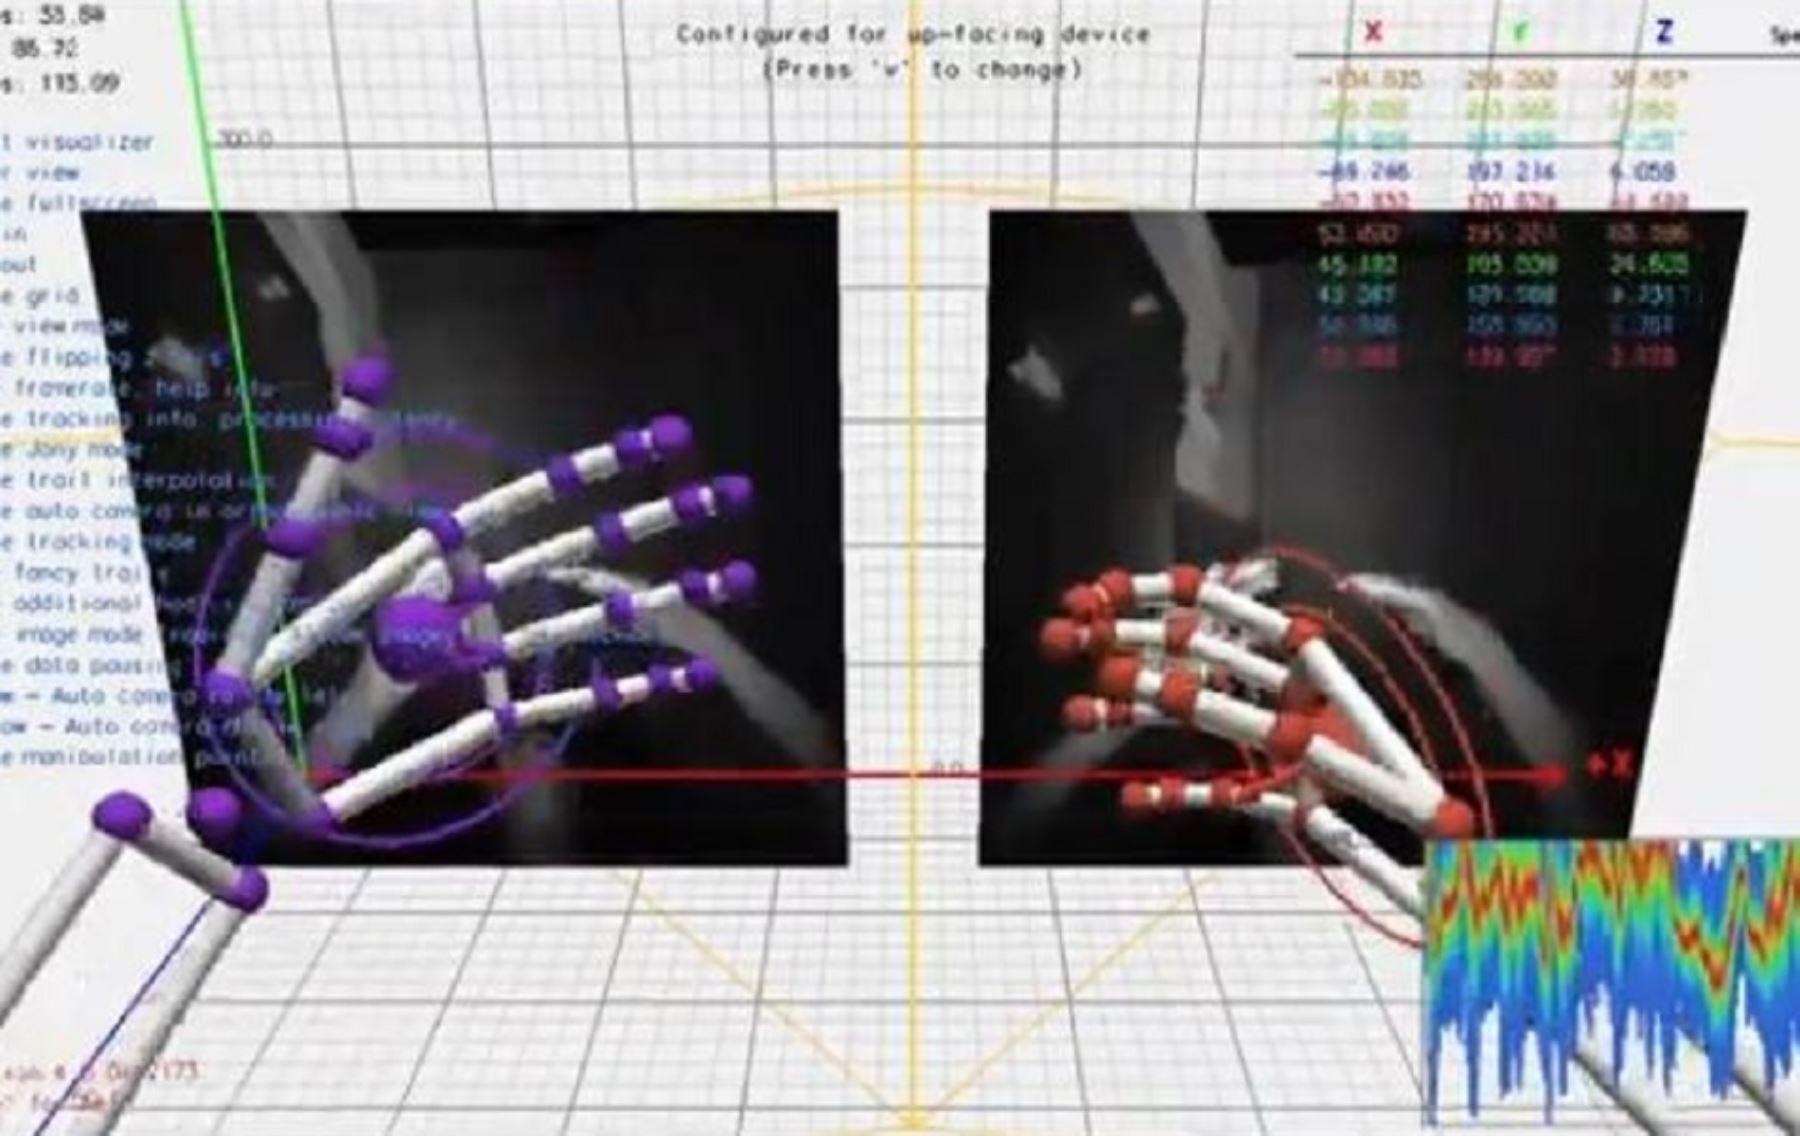 cientificos-peruanos-crean-sistema-virtual-para-tratar-encefalopatia-epileptica-infantil